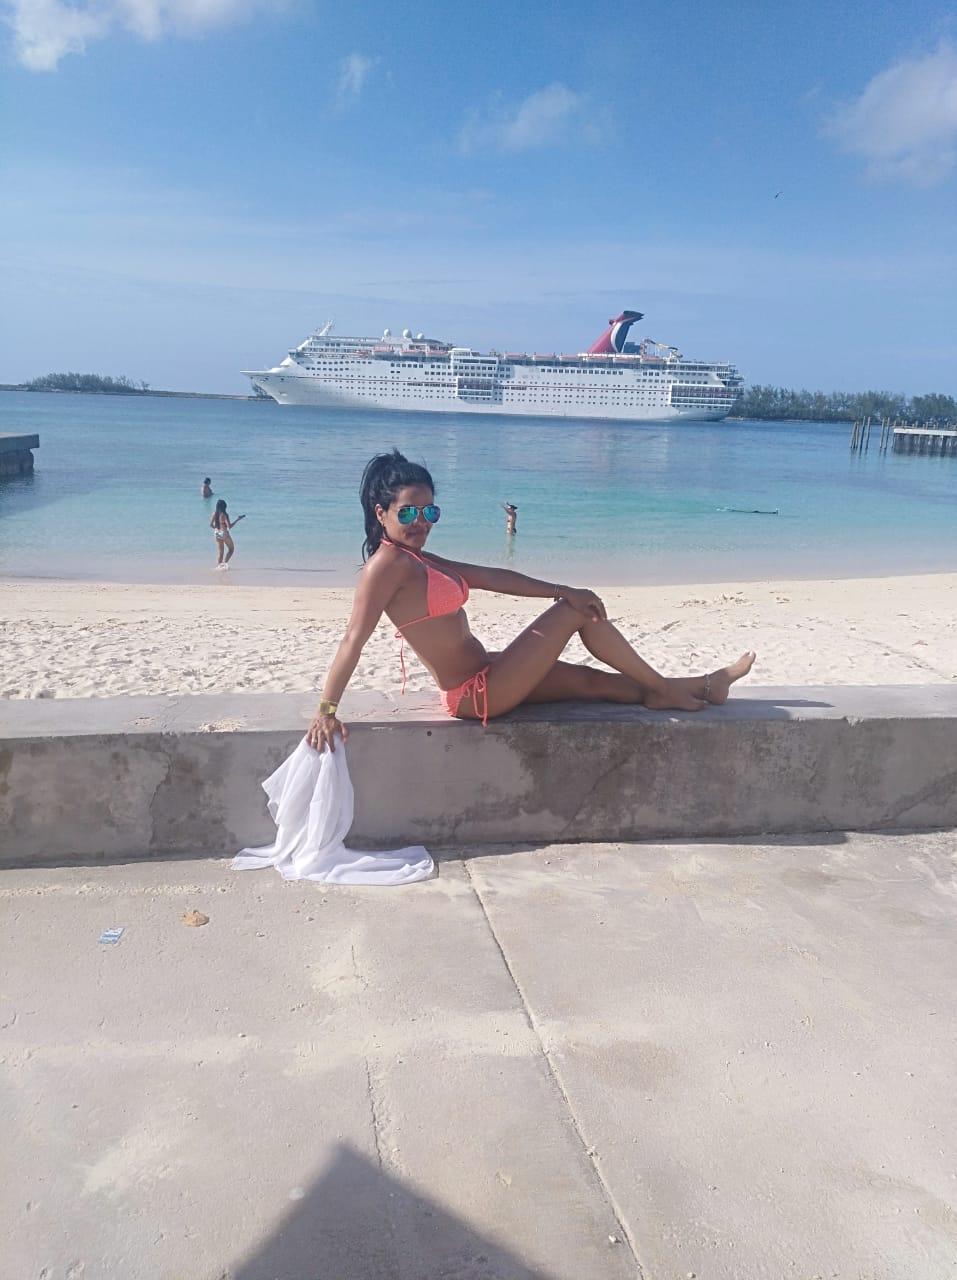 nassau escort service bahamas